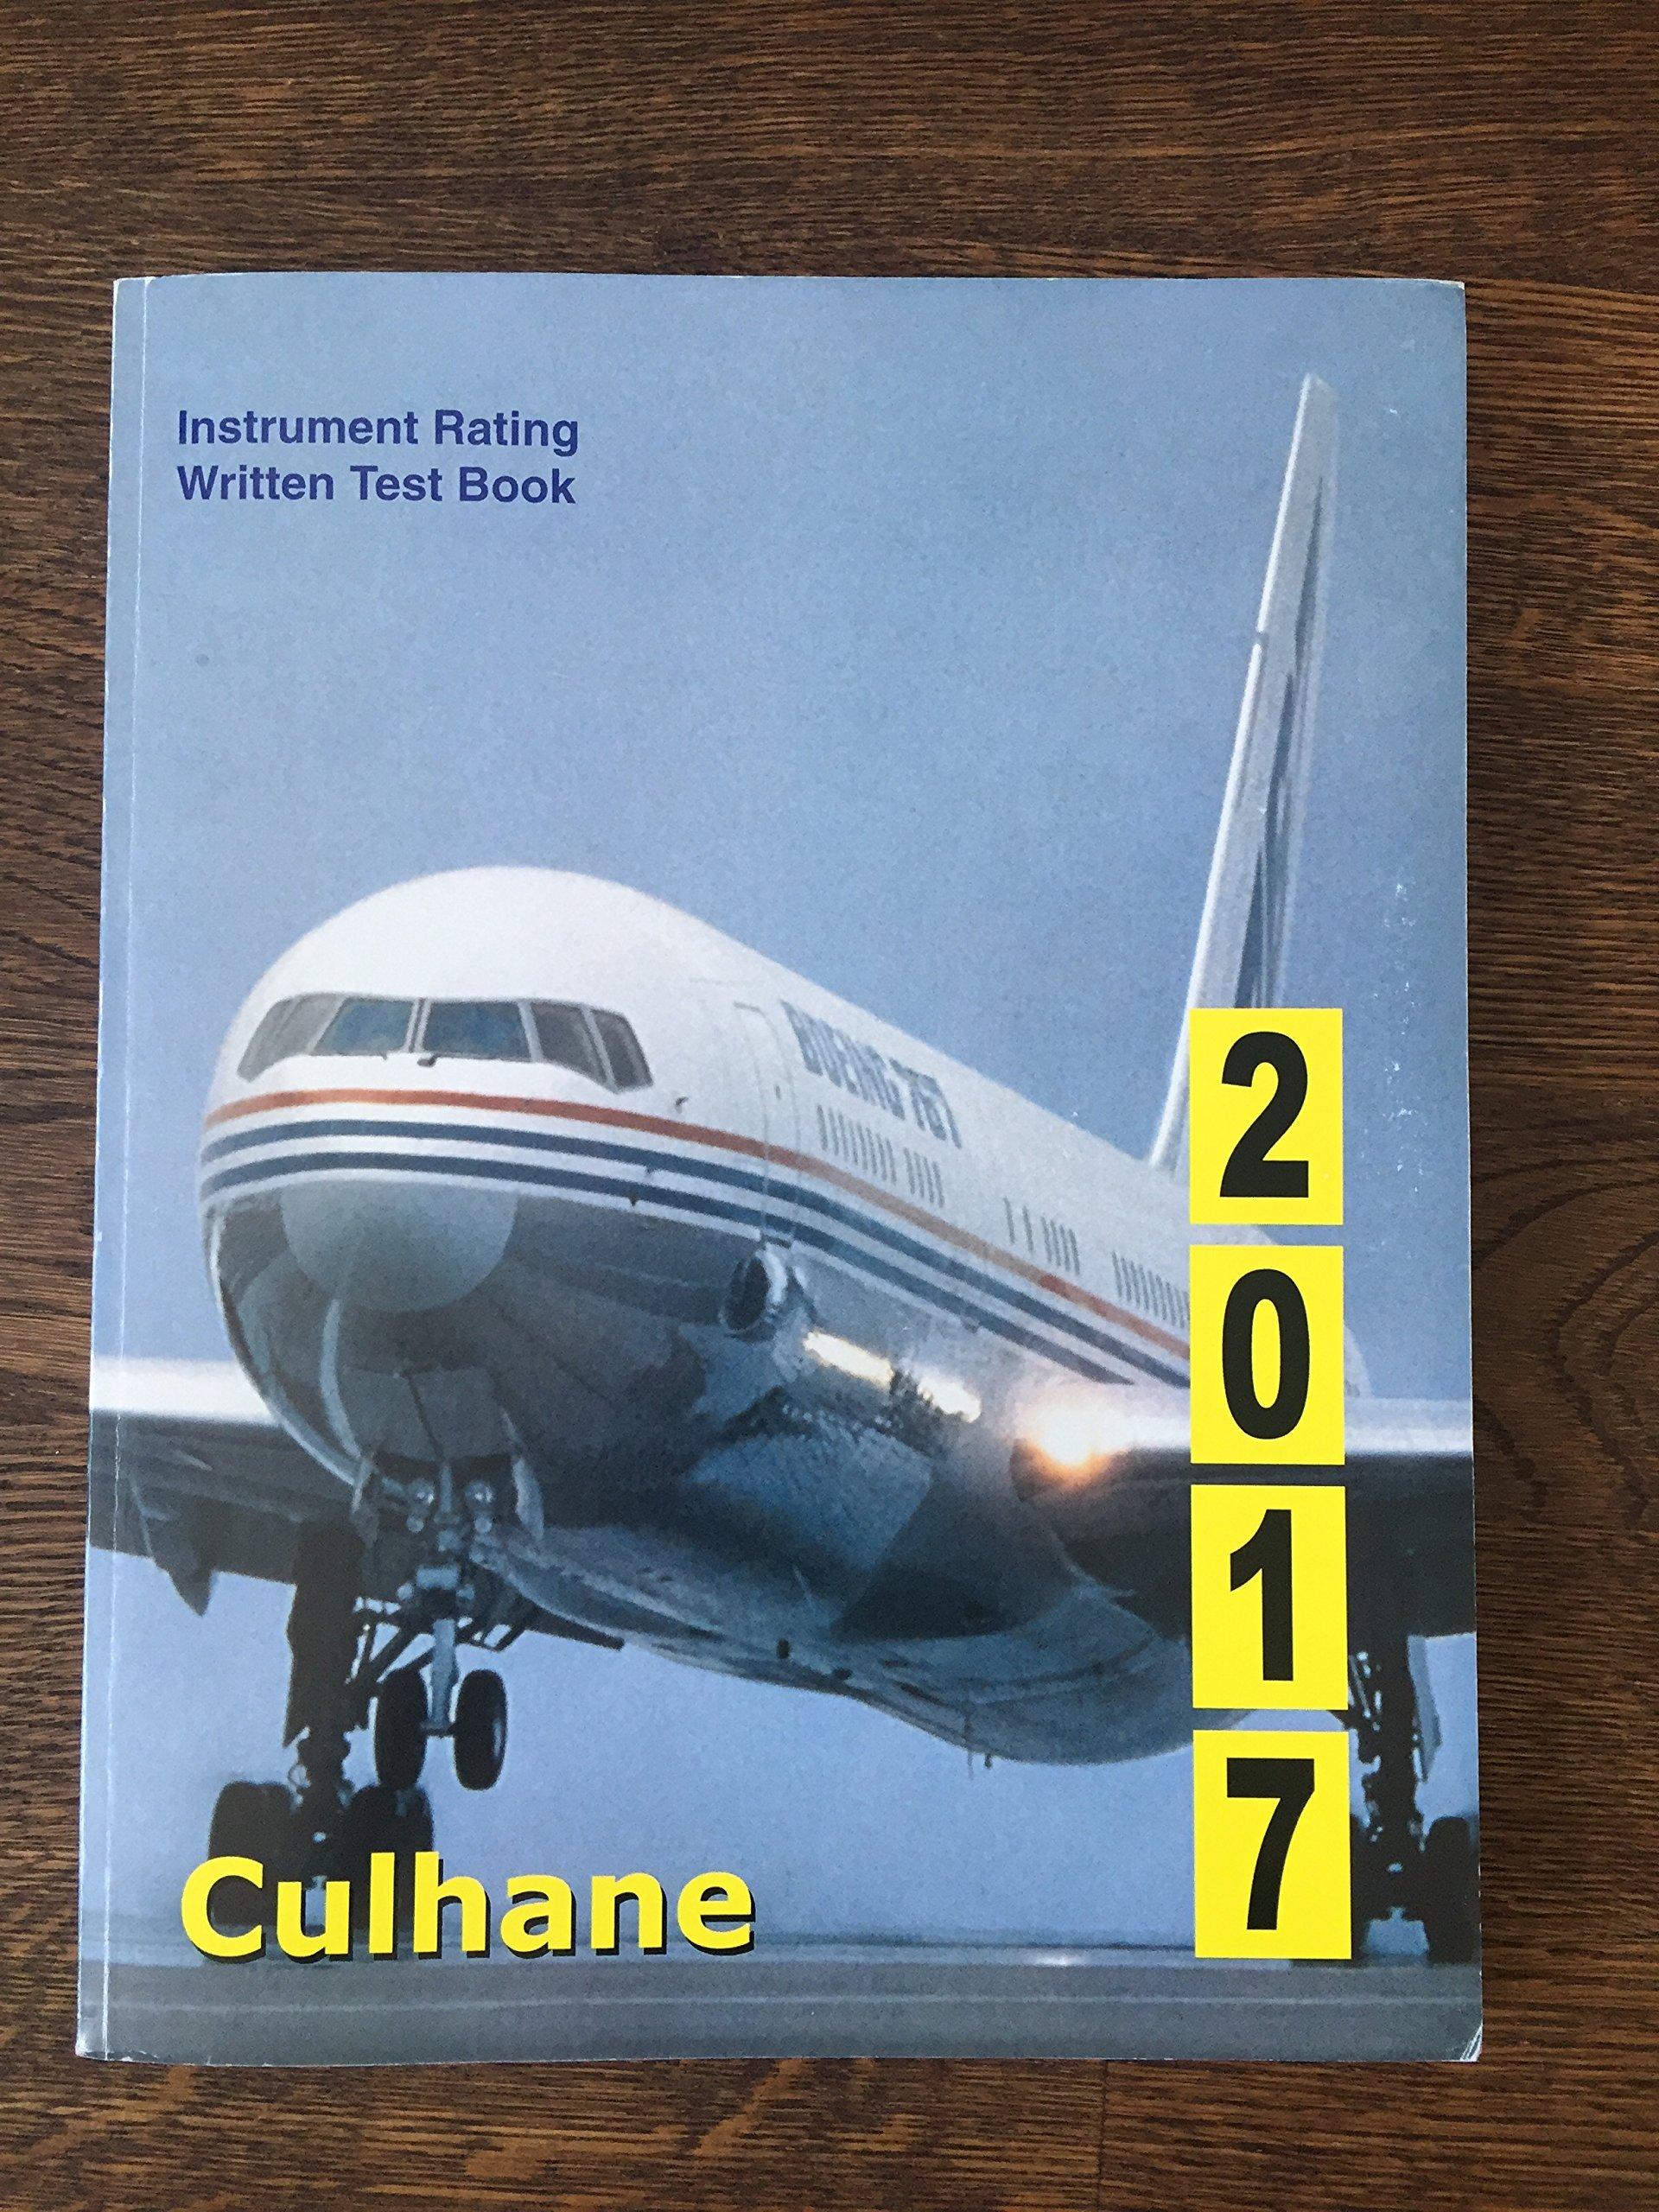 cc2a2f7ff32 Instrument Rating Written Test Book